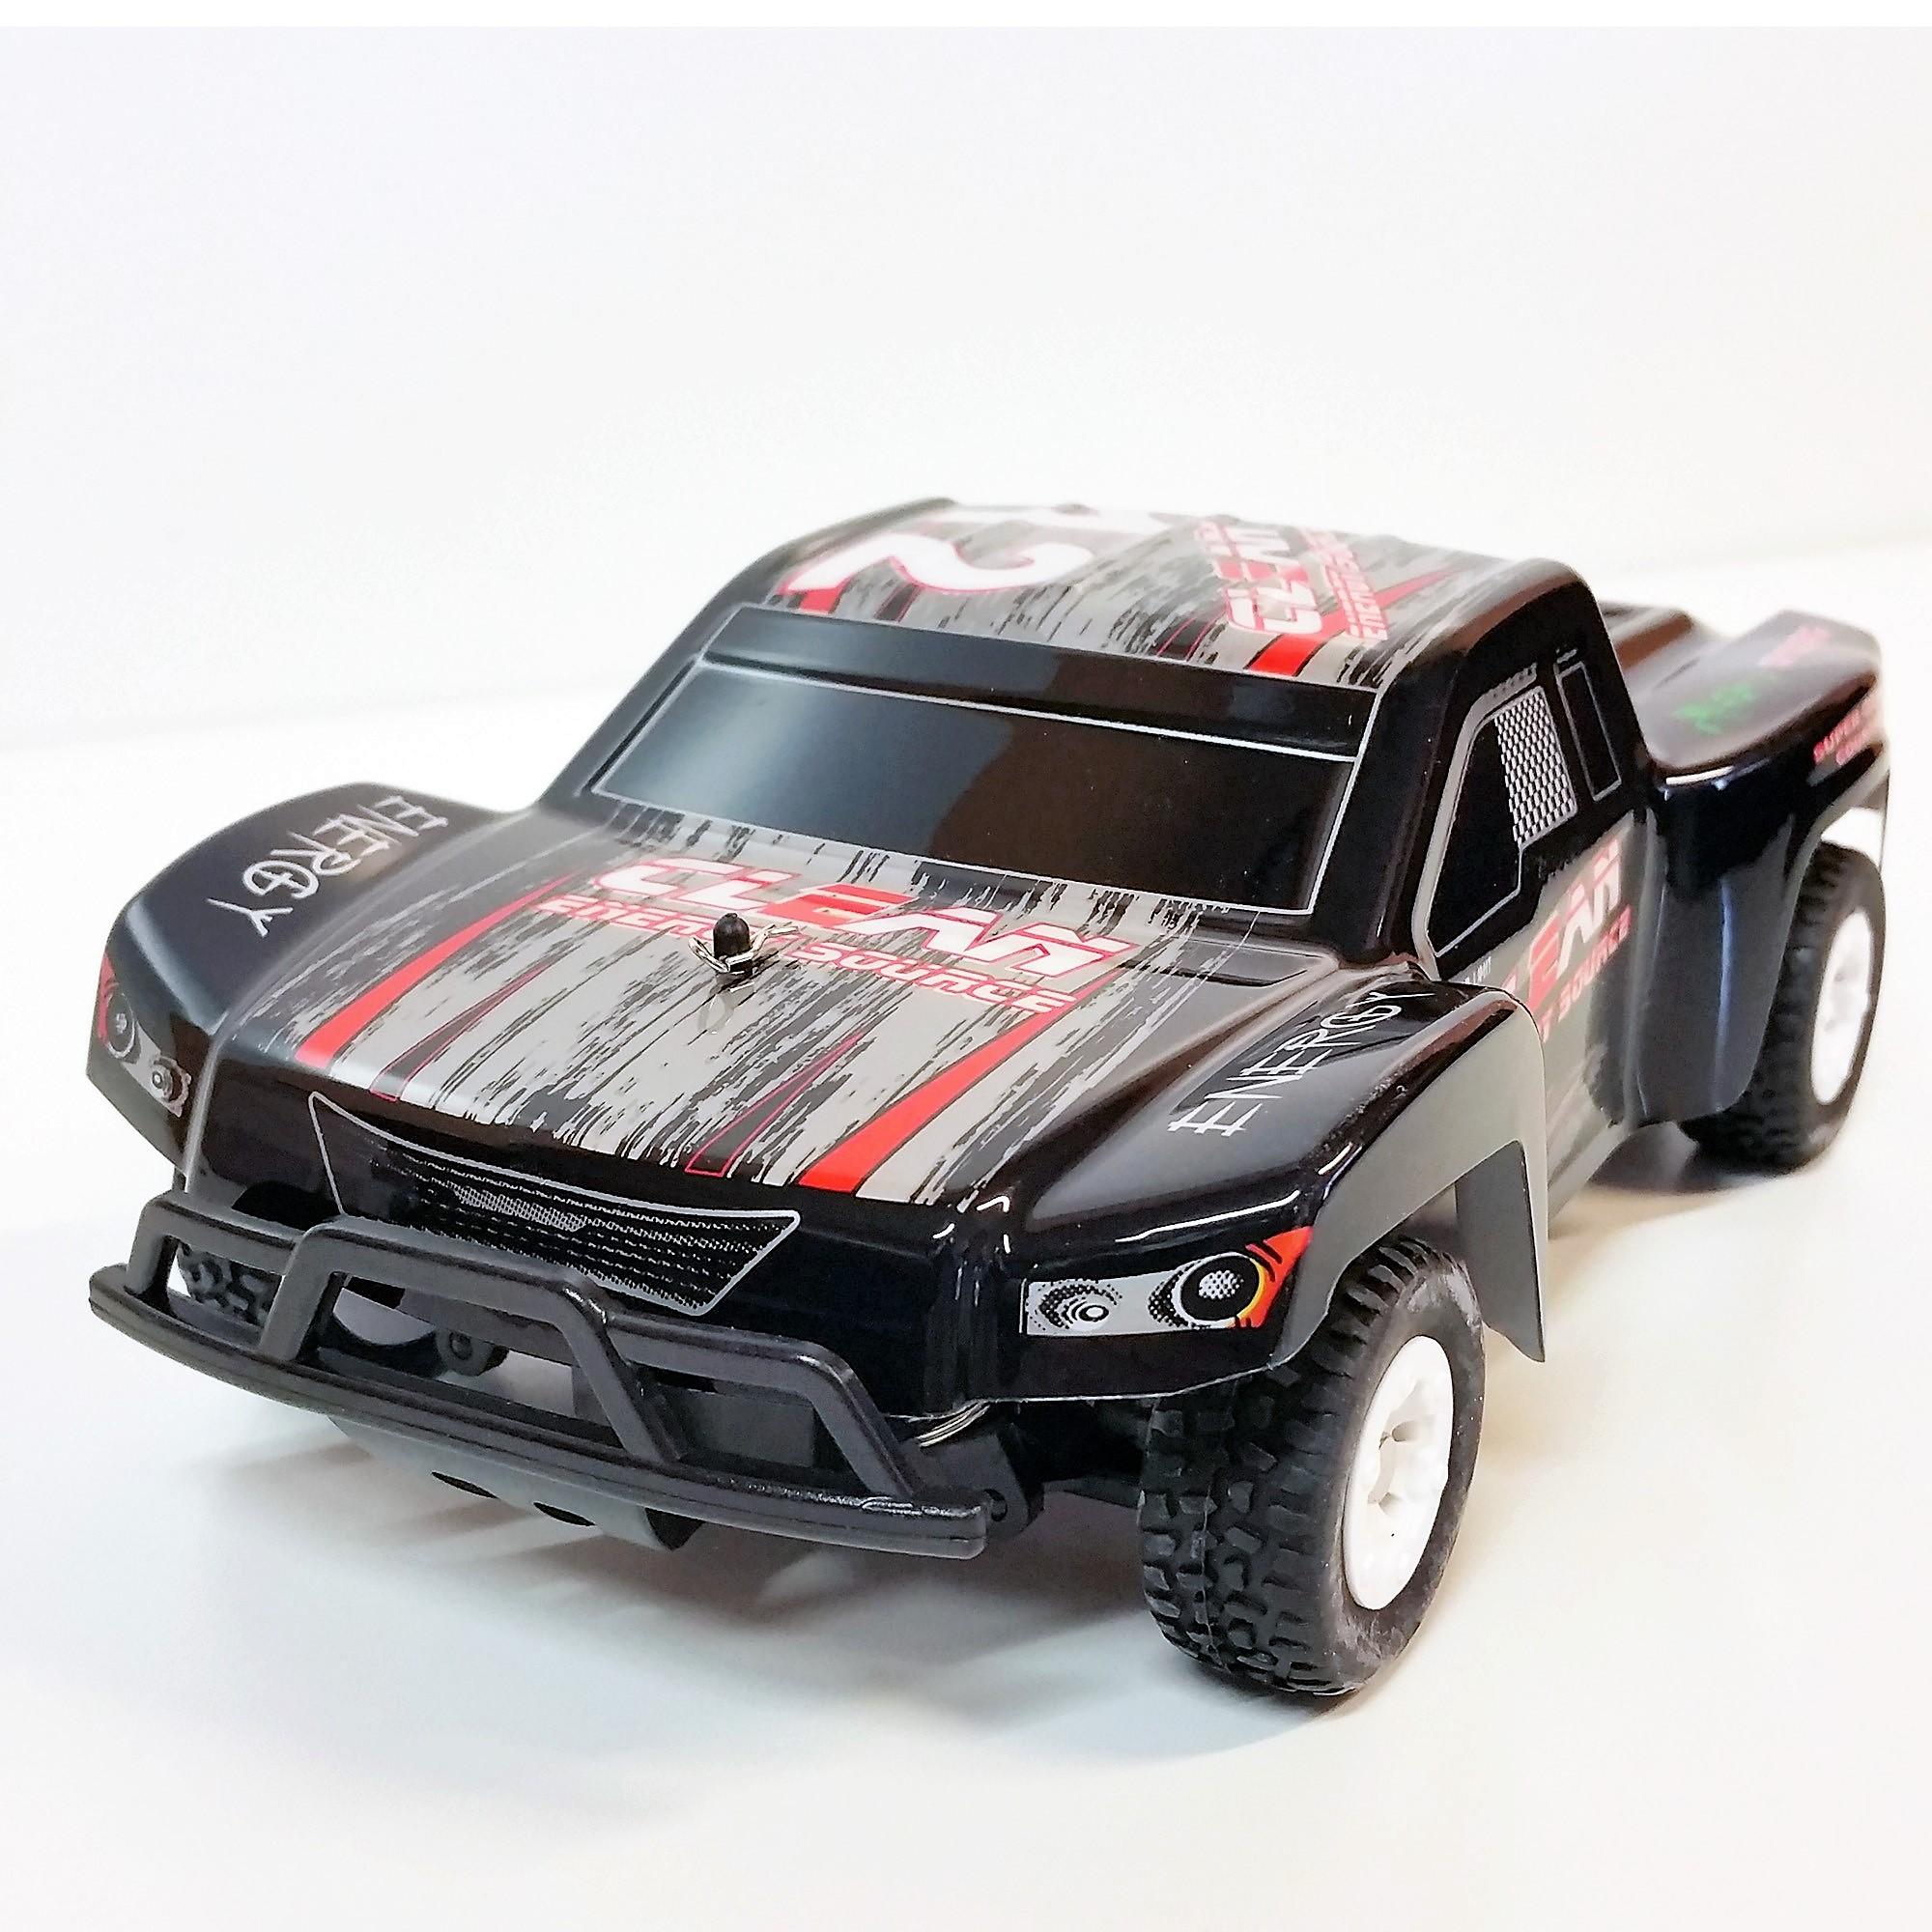 spielzeug ferngesteuertes auto monster rc buggys mit akku. Black Bedroom Furniture Sets. Home Design Ideas